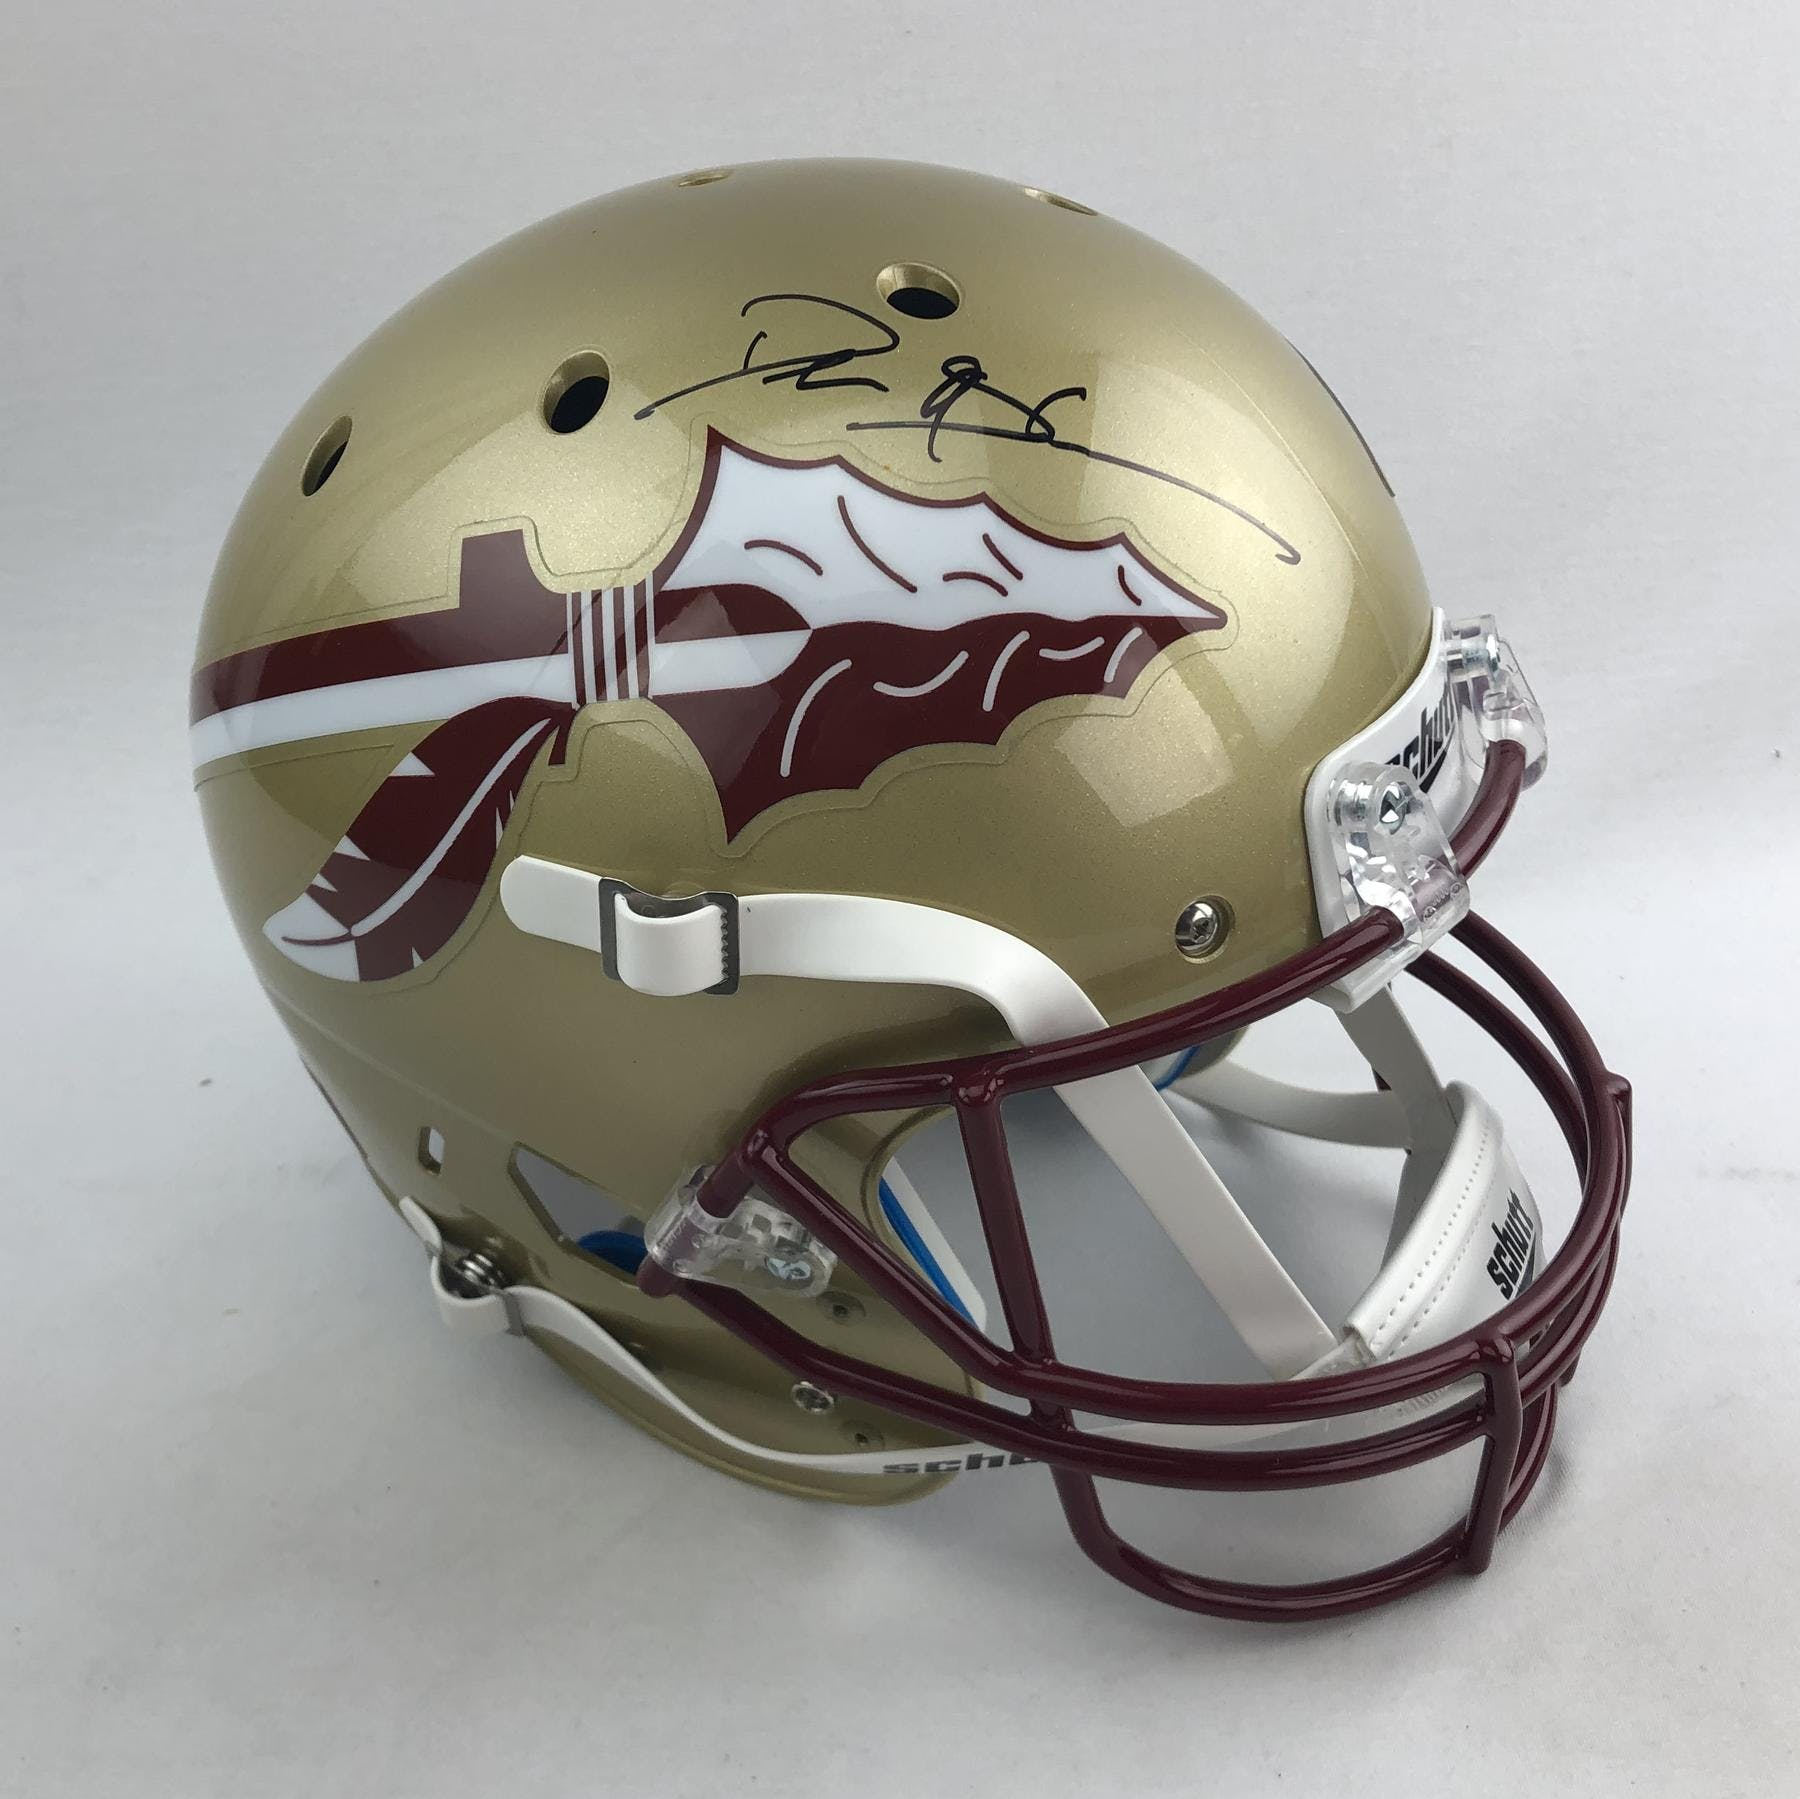 sale retailer 9557d ddba6 Deion Sanders Autographed Florida State Seminoles Full Size Replica Helmet  (Beckett COA)